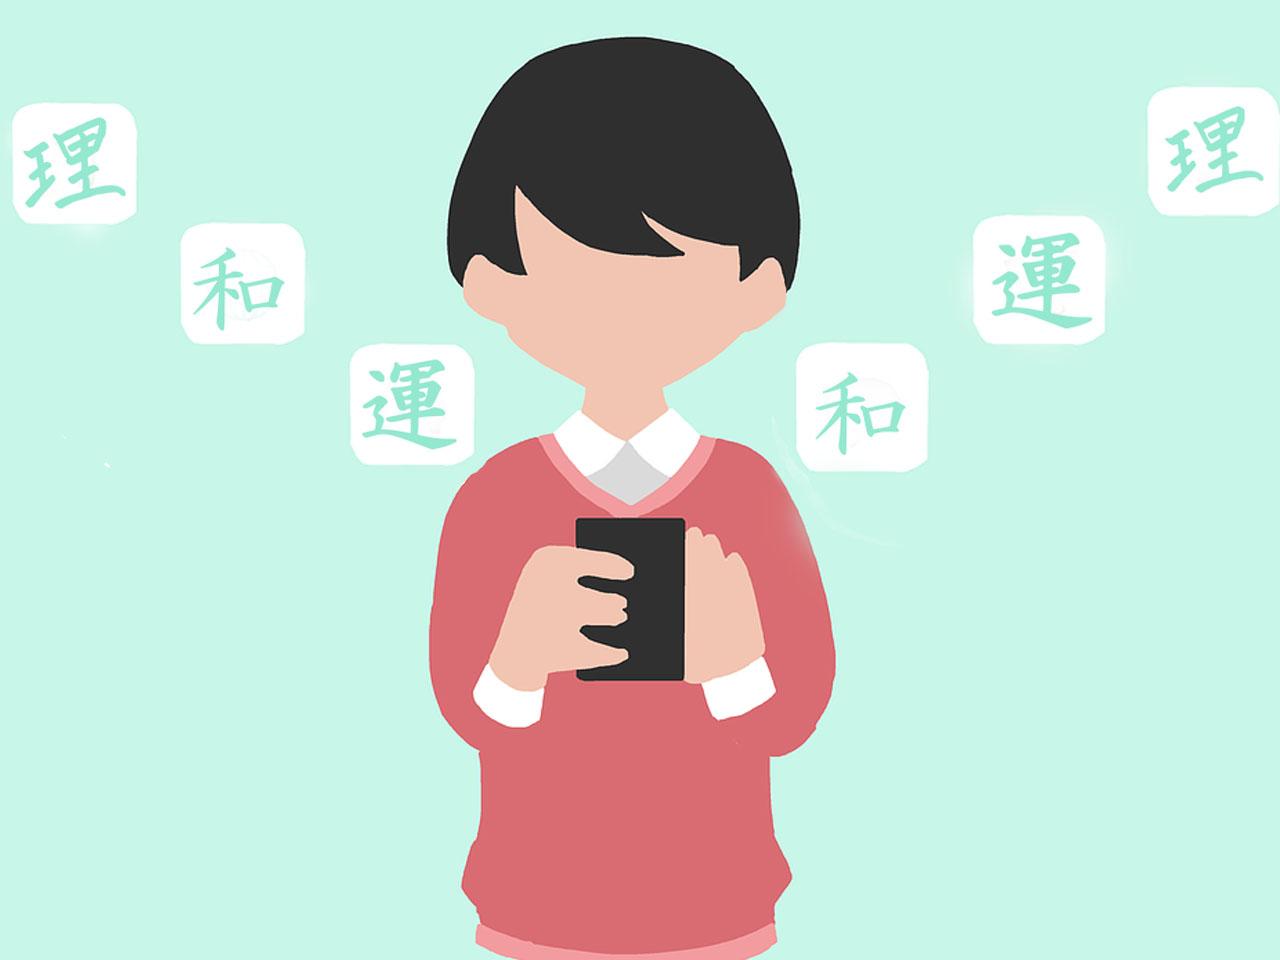 Top 2016 de apps de Android en español para aprender japonés